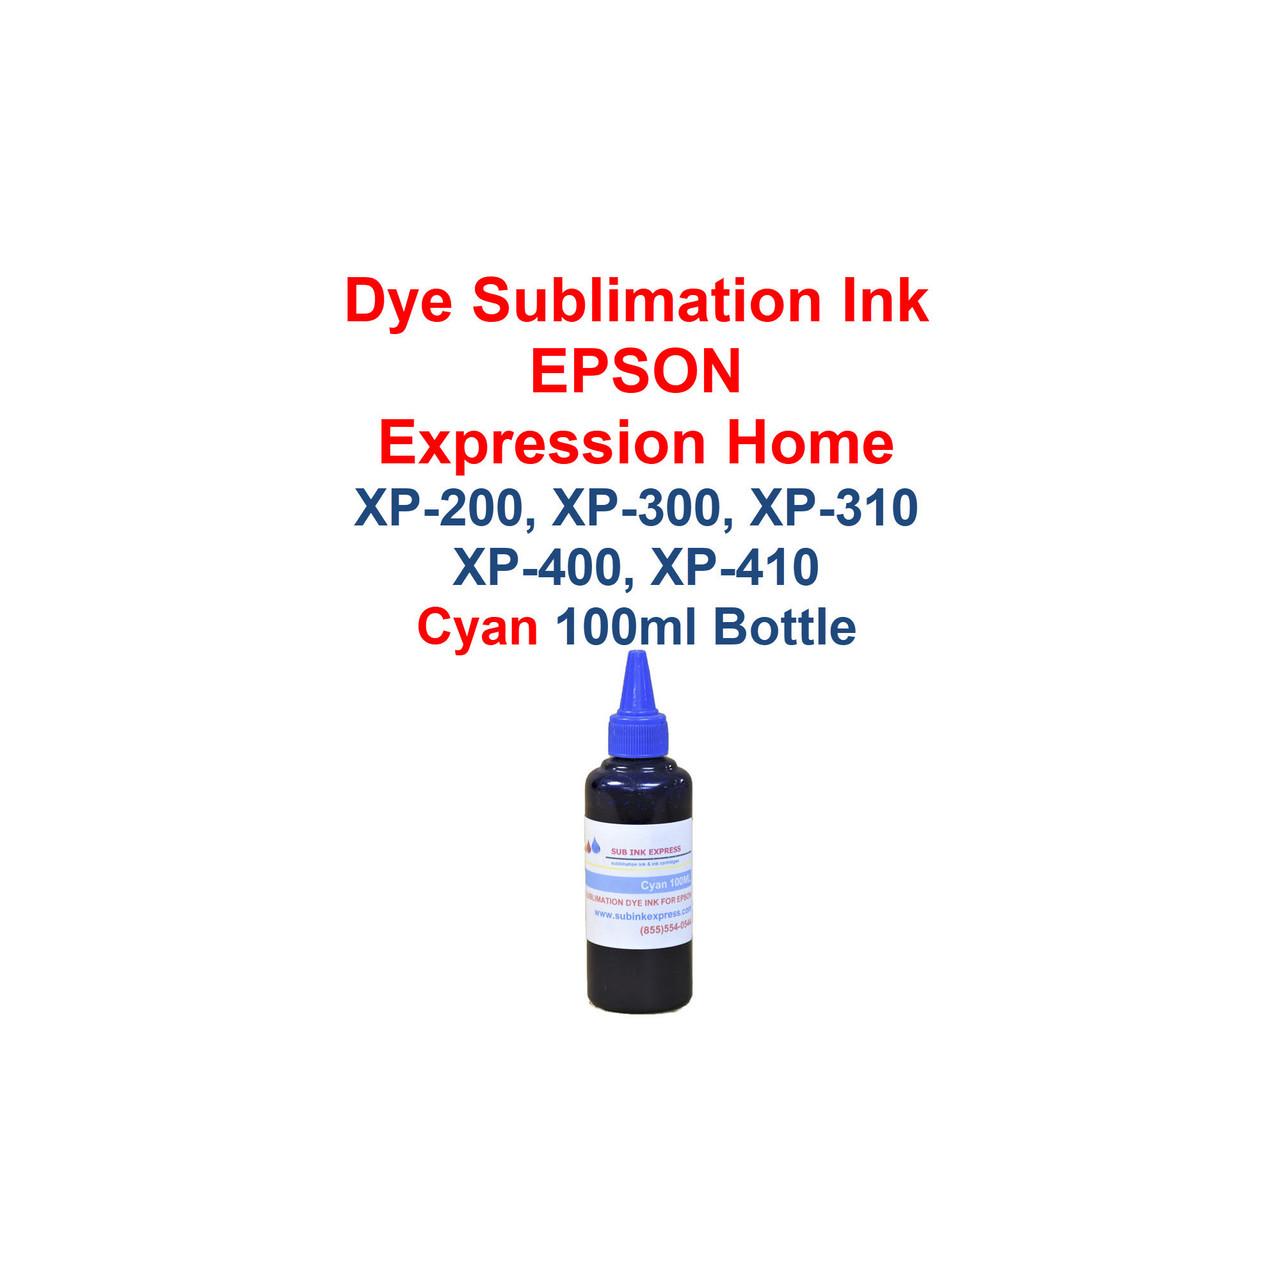 Dye Sublimation ink 4- 100ml bottles Refillable Ink Cartridges for Epson Expression Home xp-200 xp-300 xp-310 xp-400 xp-410 printers